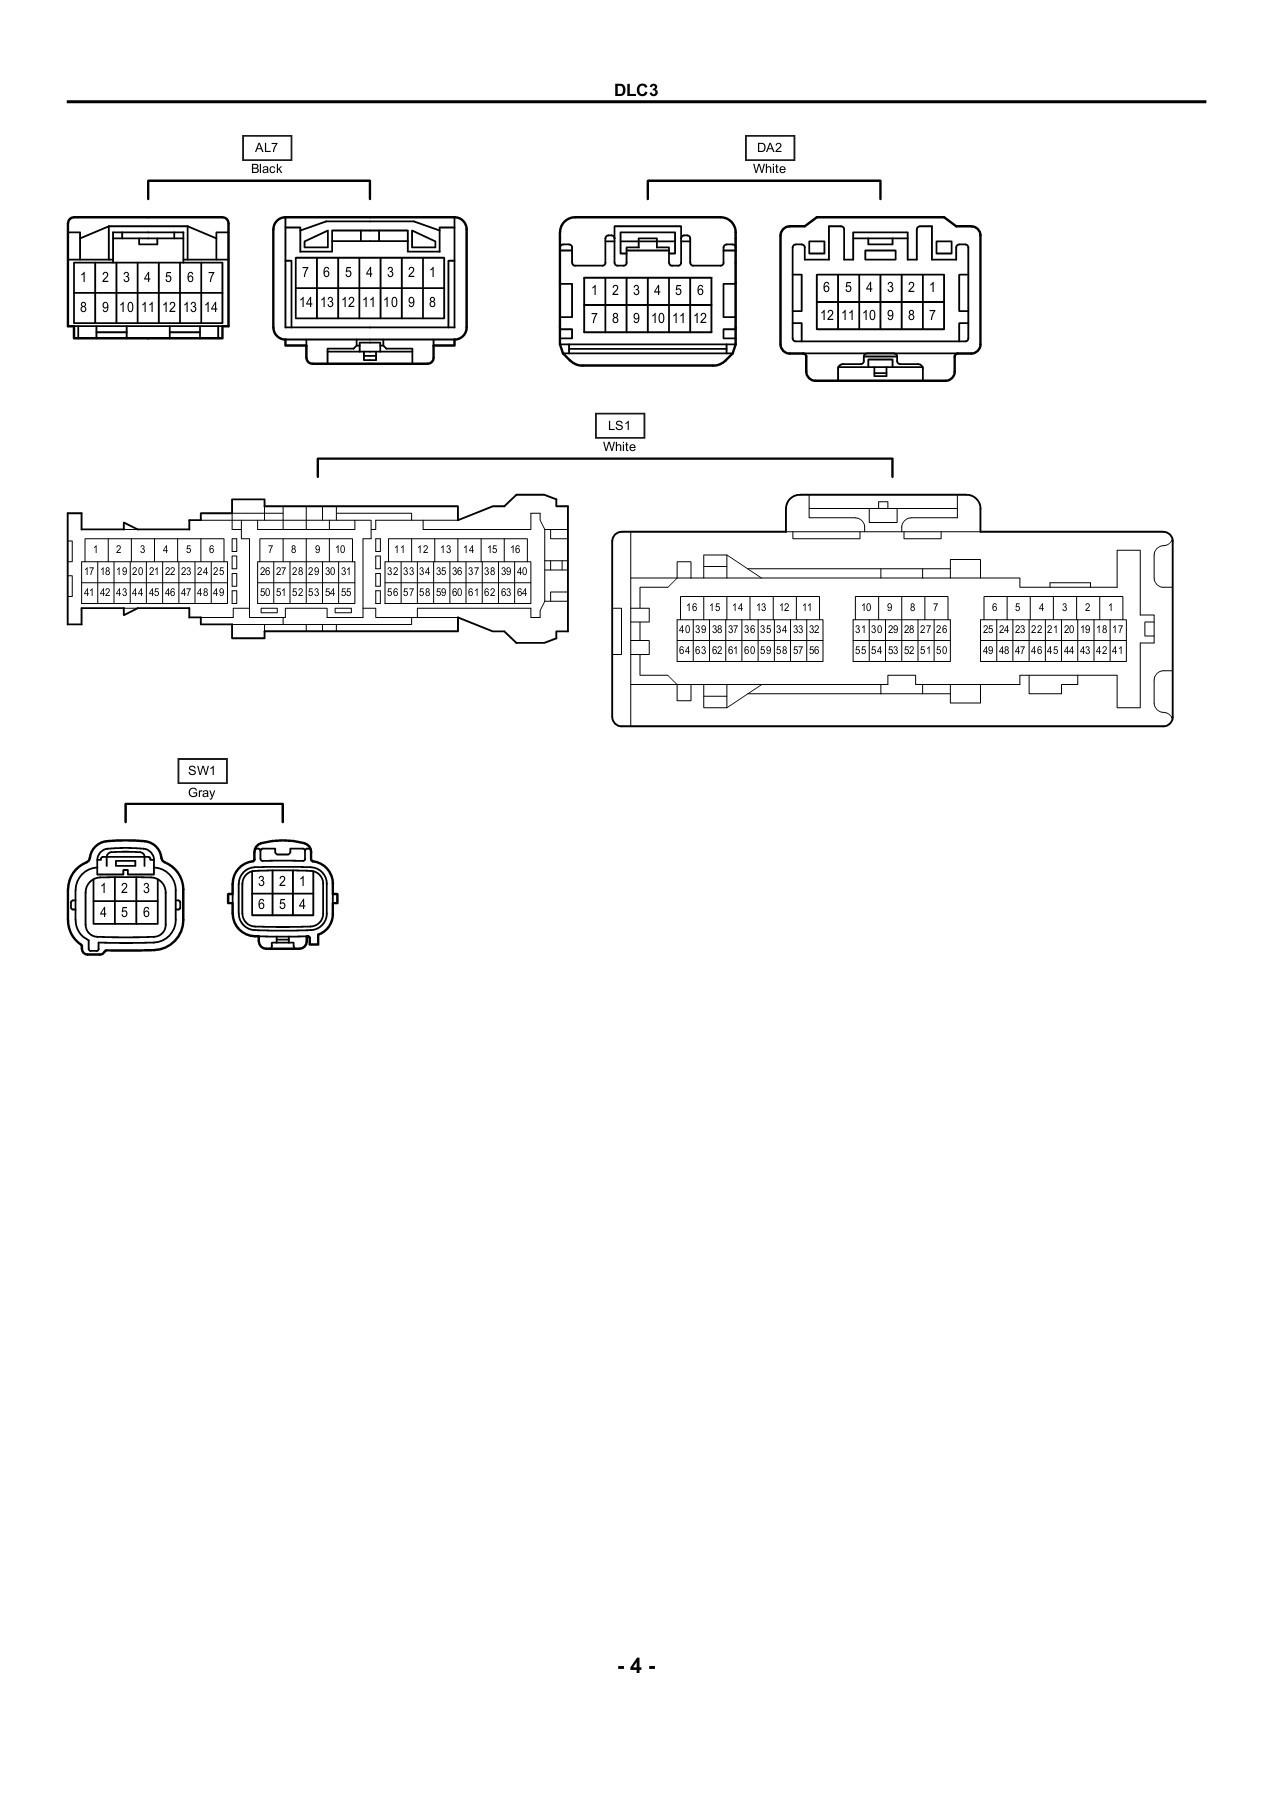 medium resolution of toyota prius 2010 electrical wiring diagrams pages 151 200 text toyota prius 2010 electrical wiring diagrams